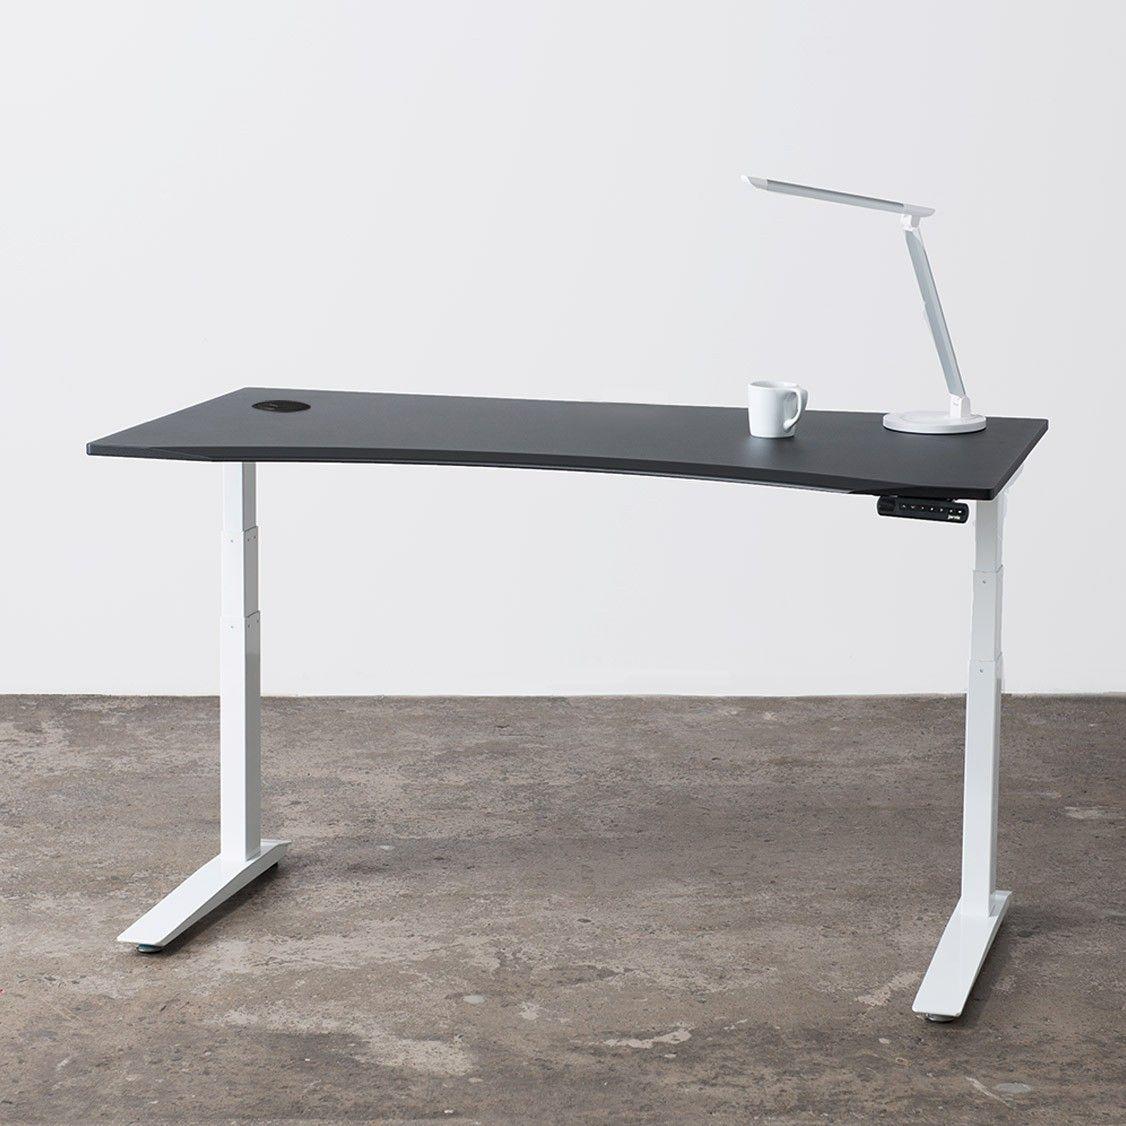 Jarvis Powdercoated Standing Desk